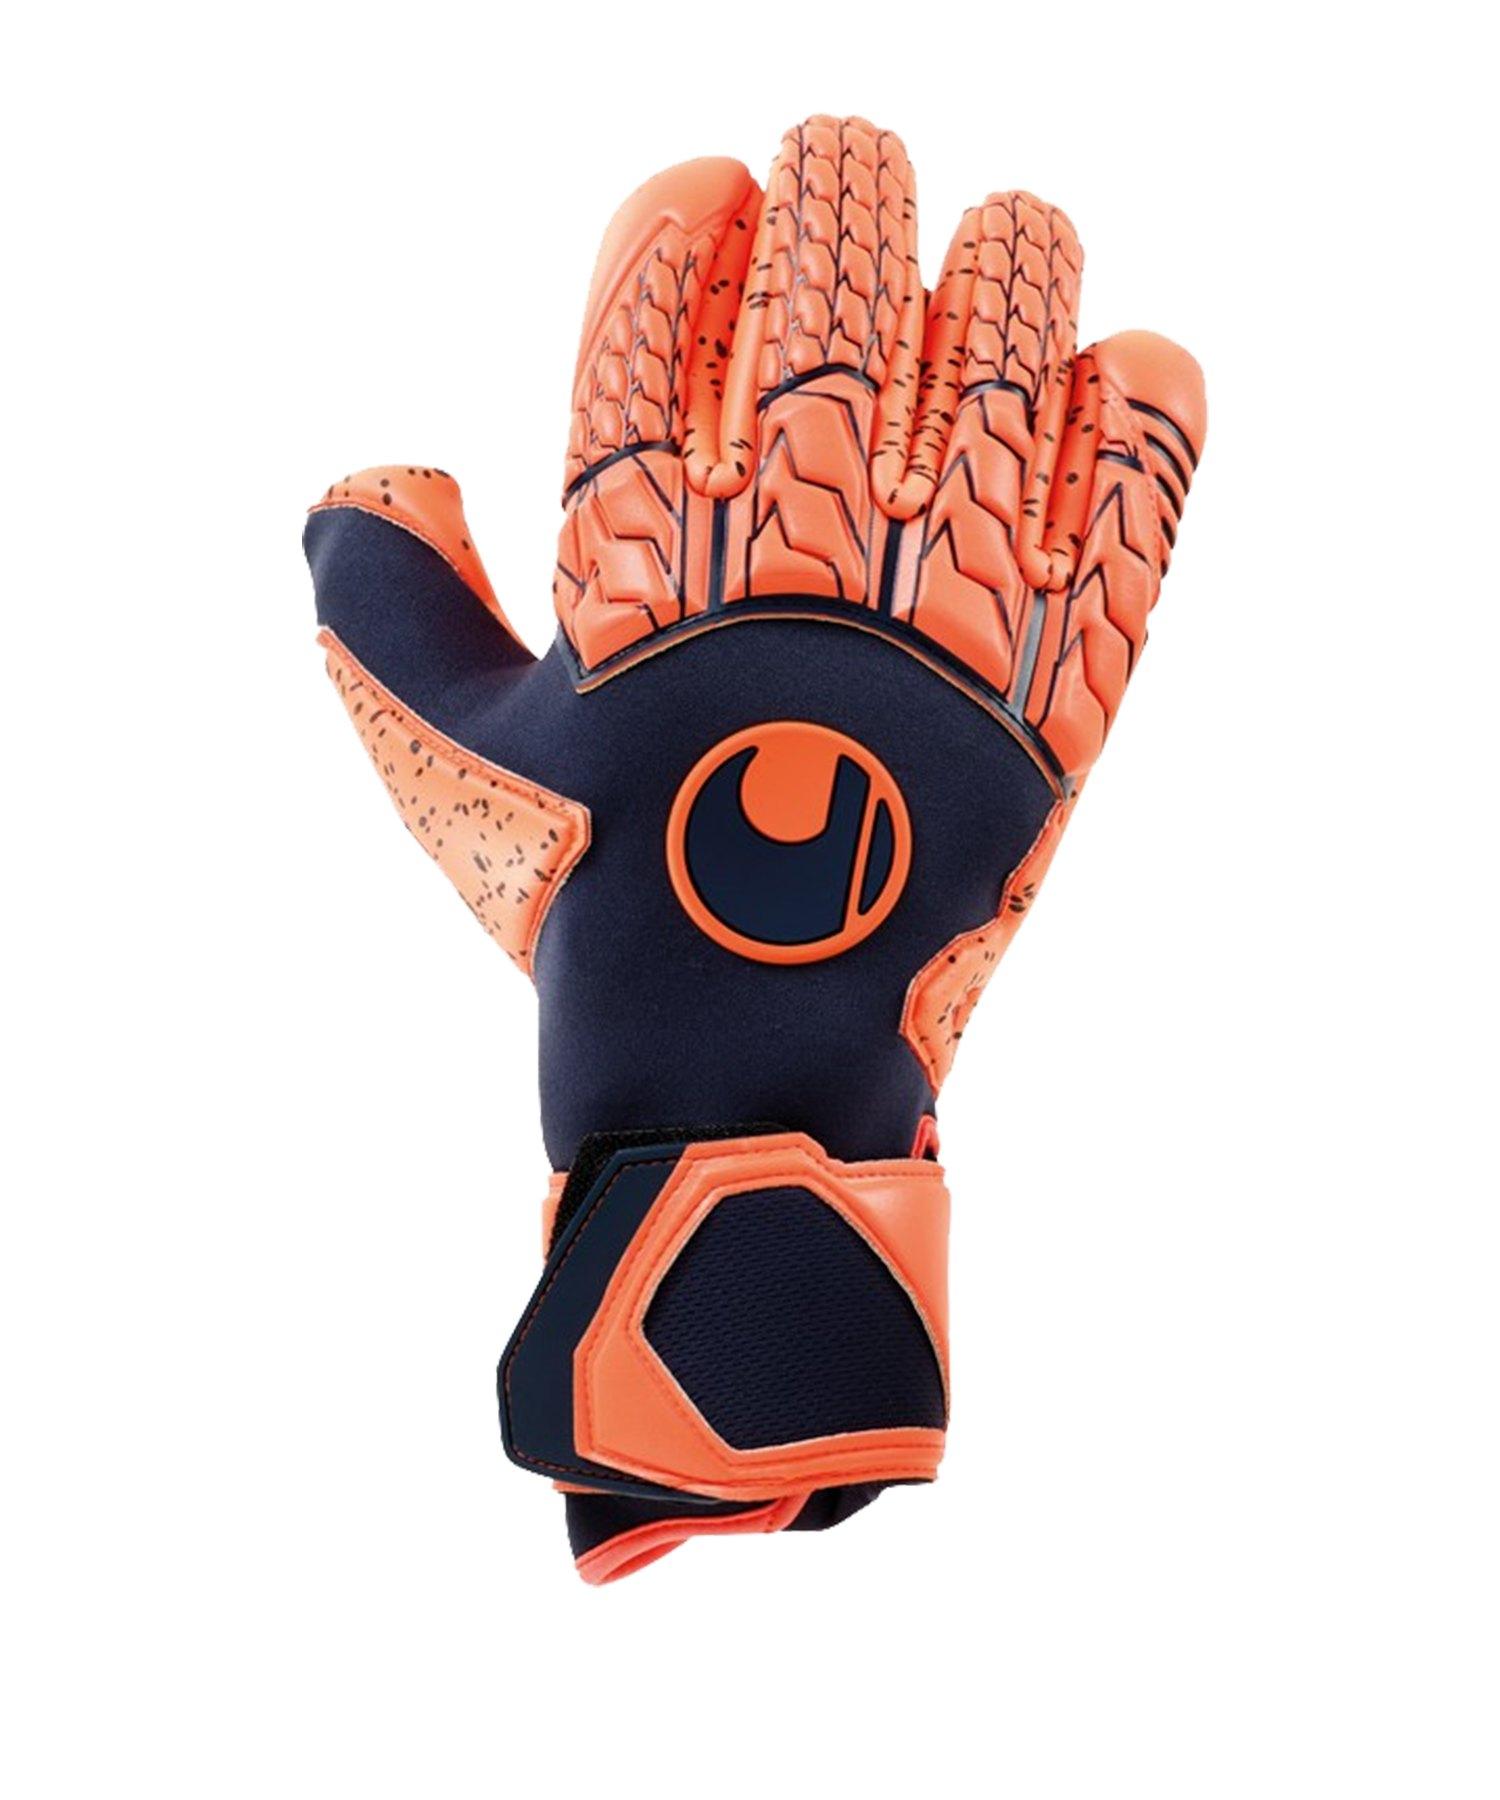 Uhlsport Next Level Supergrip Finger Surround TW-Handschuh Orange F01 - blau